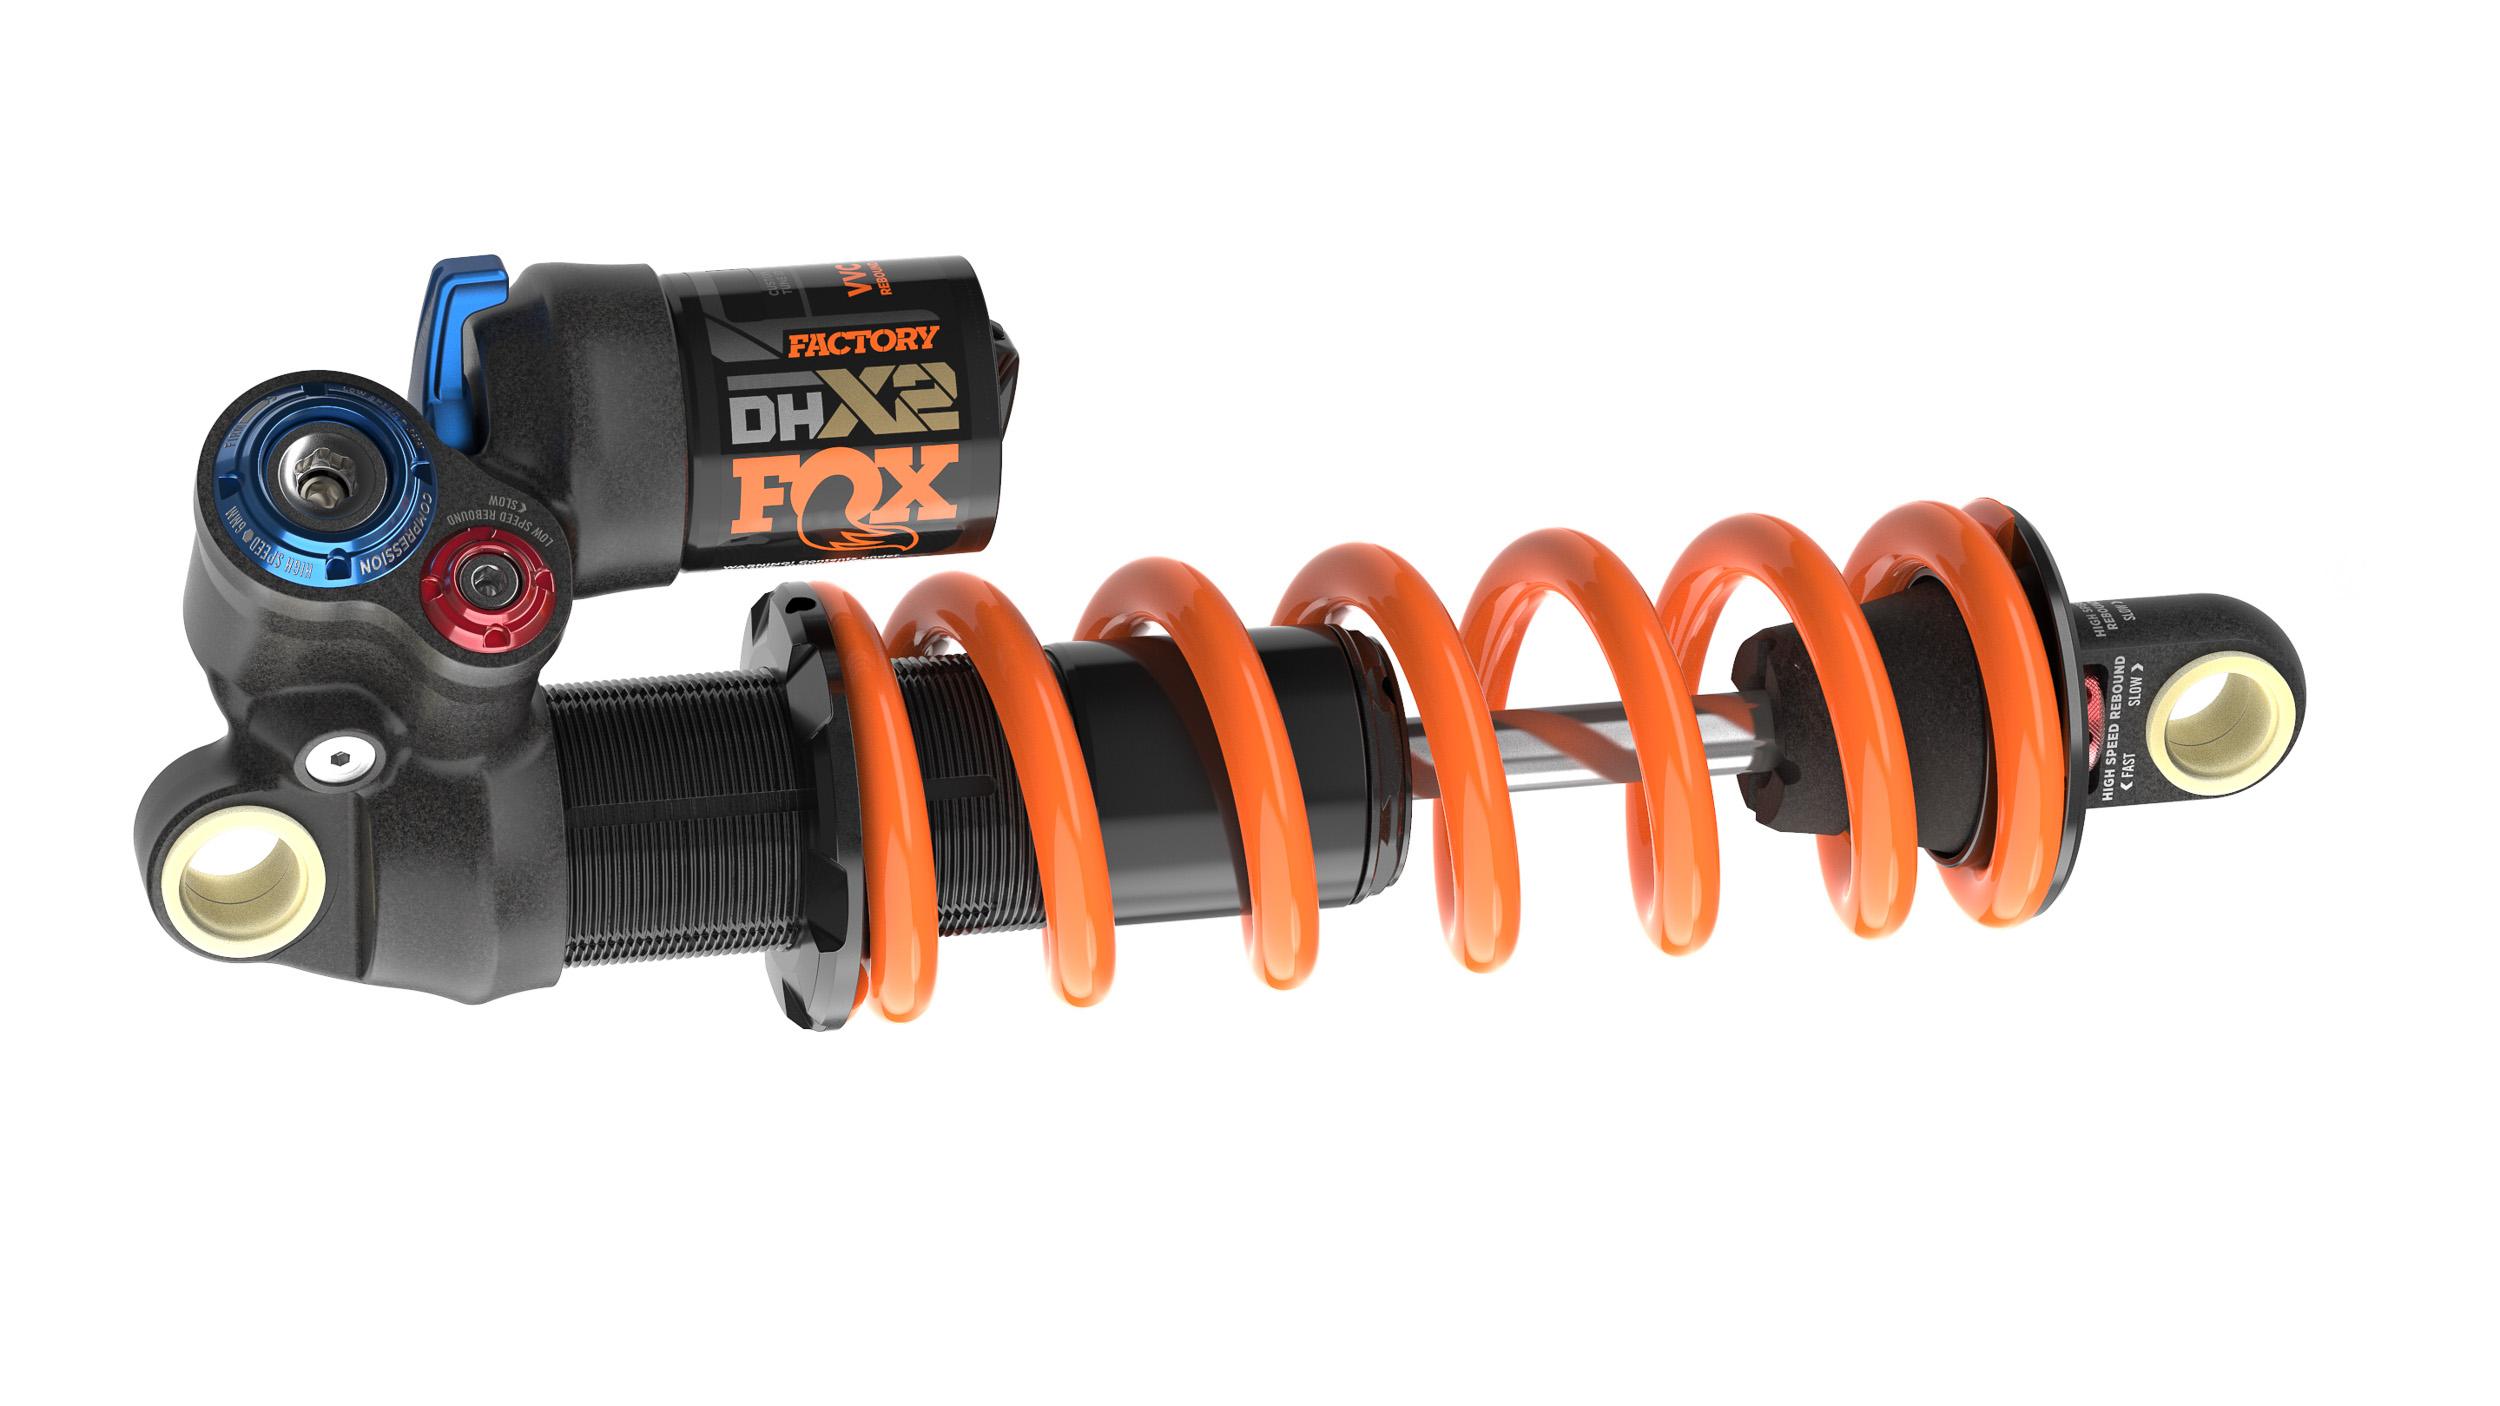 dhx2-factory-lever-standard-hero-3qtr.jp